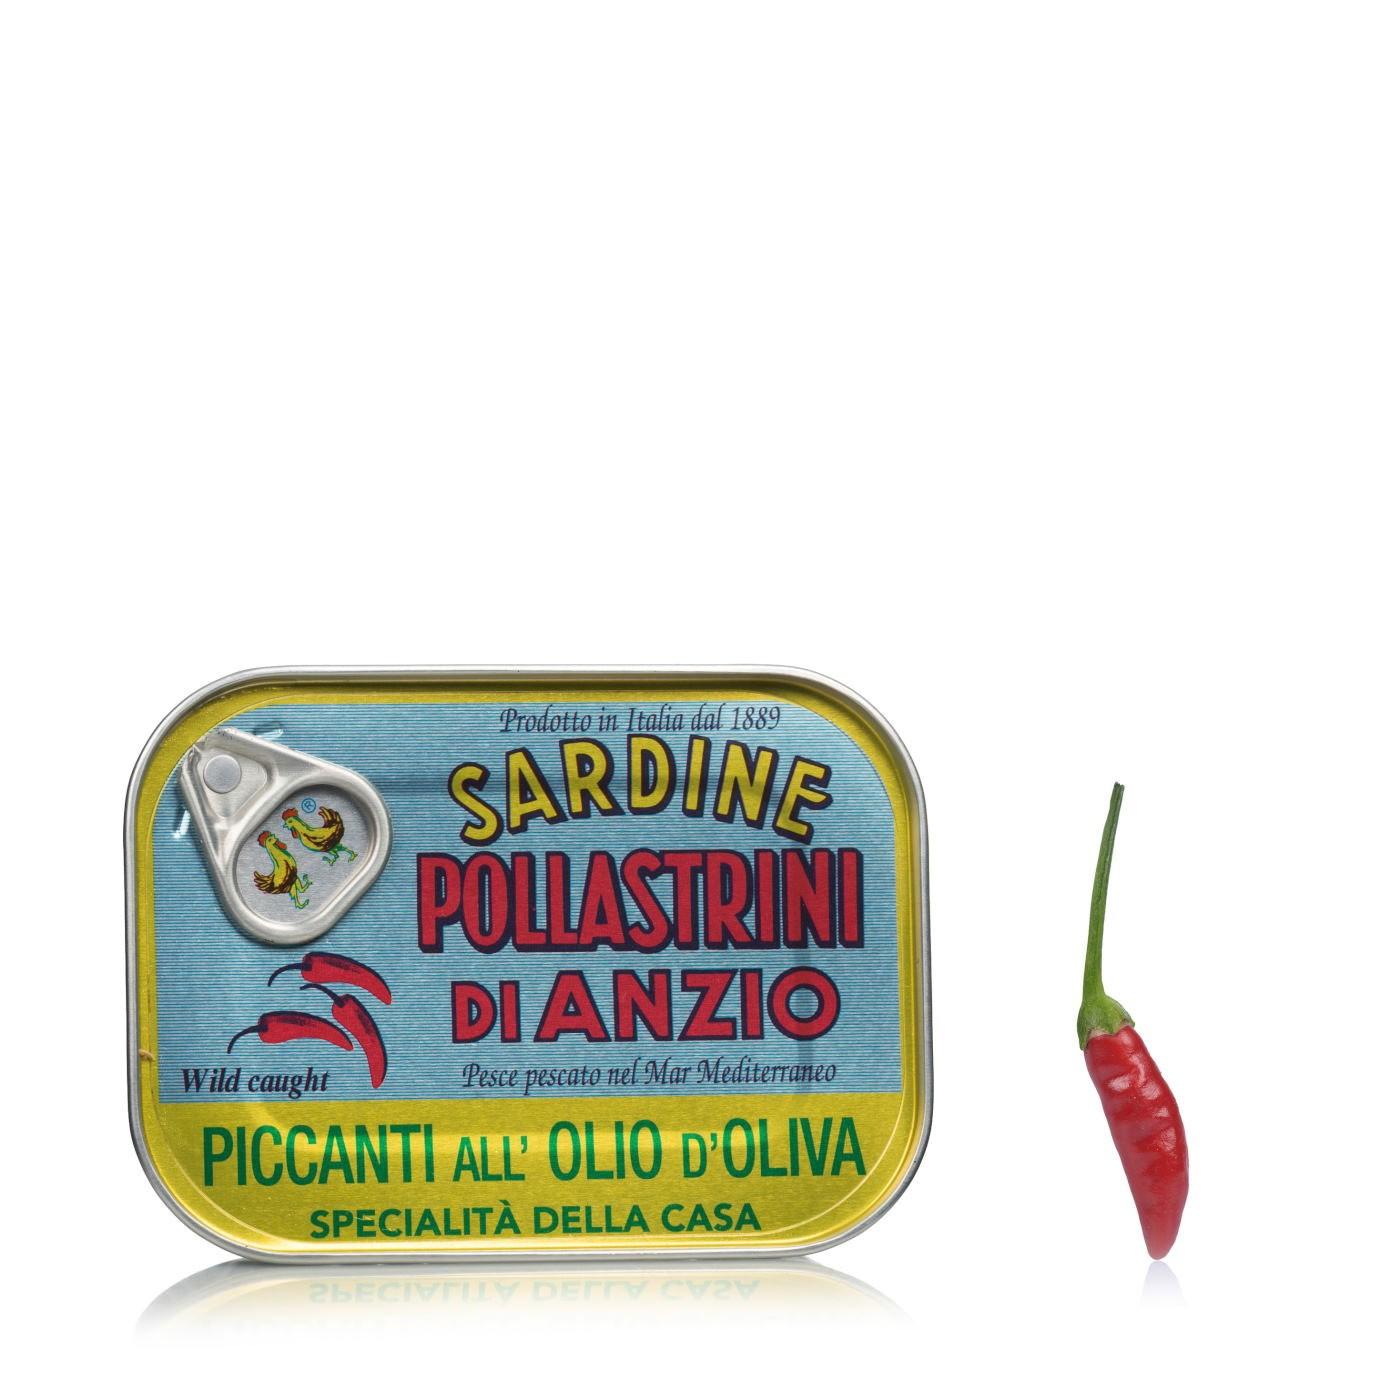 Spicy Sardines In Olive Oil 3.52 oz - Pollastrini | Eataly.com